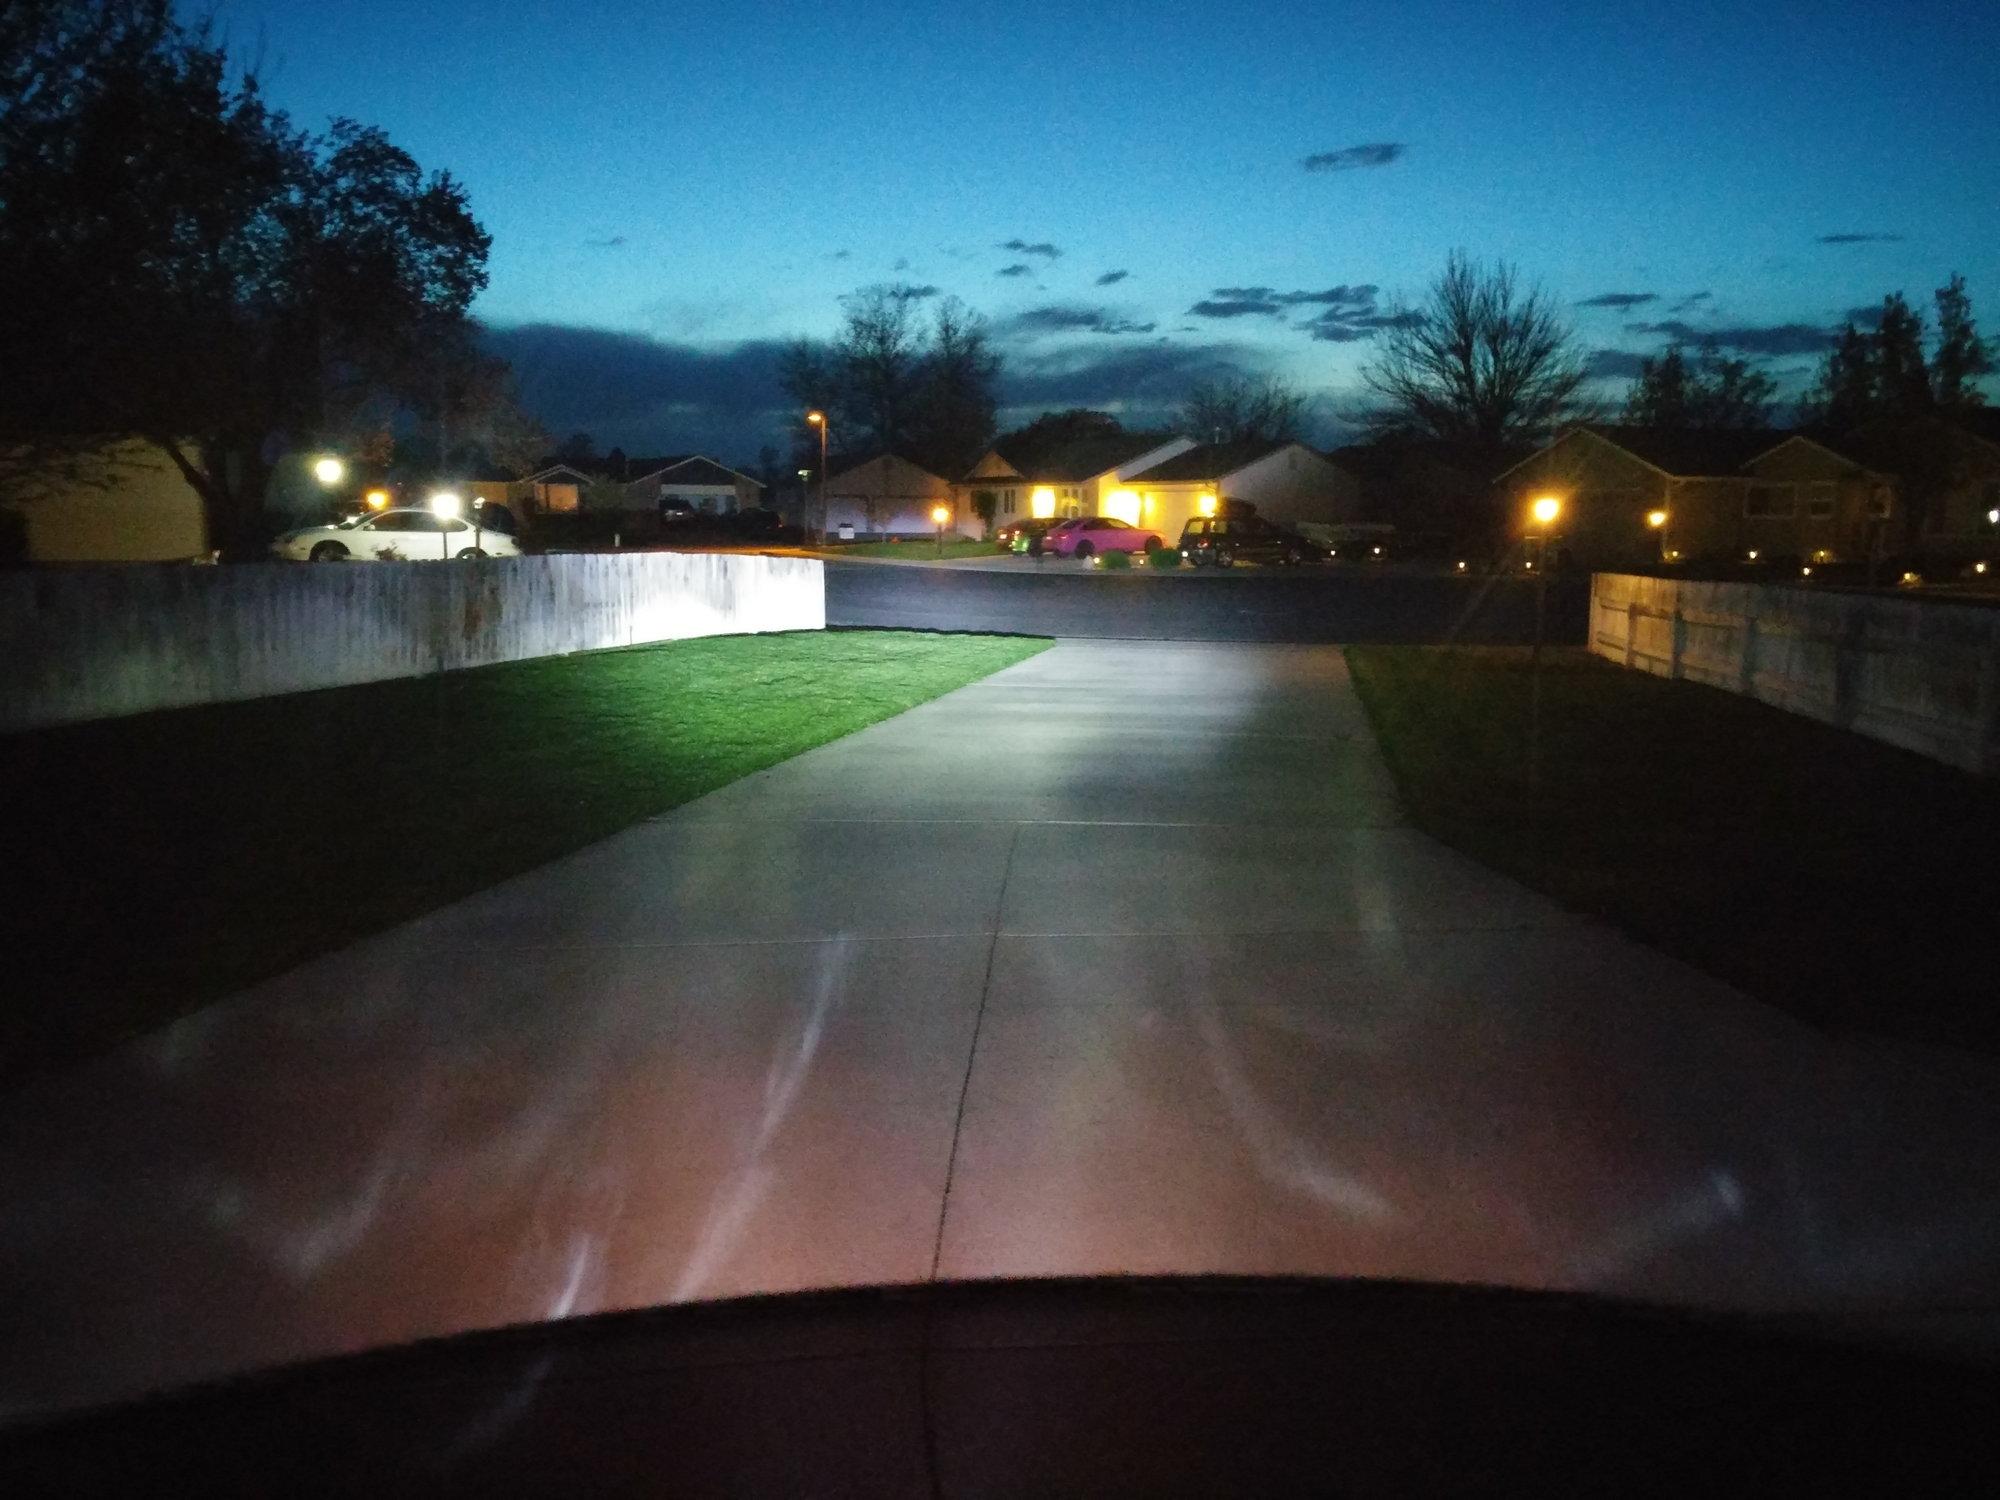 Navigatorz Led Vs Headwinds Led Review Harley Davidson Forums